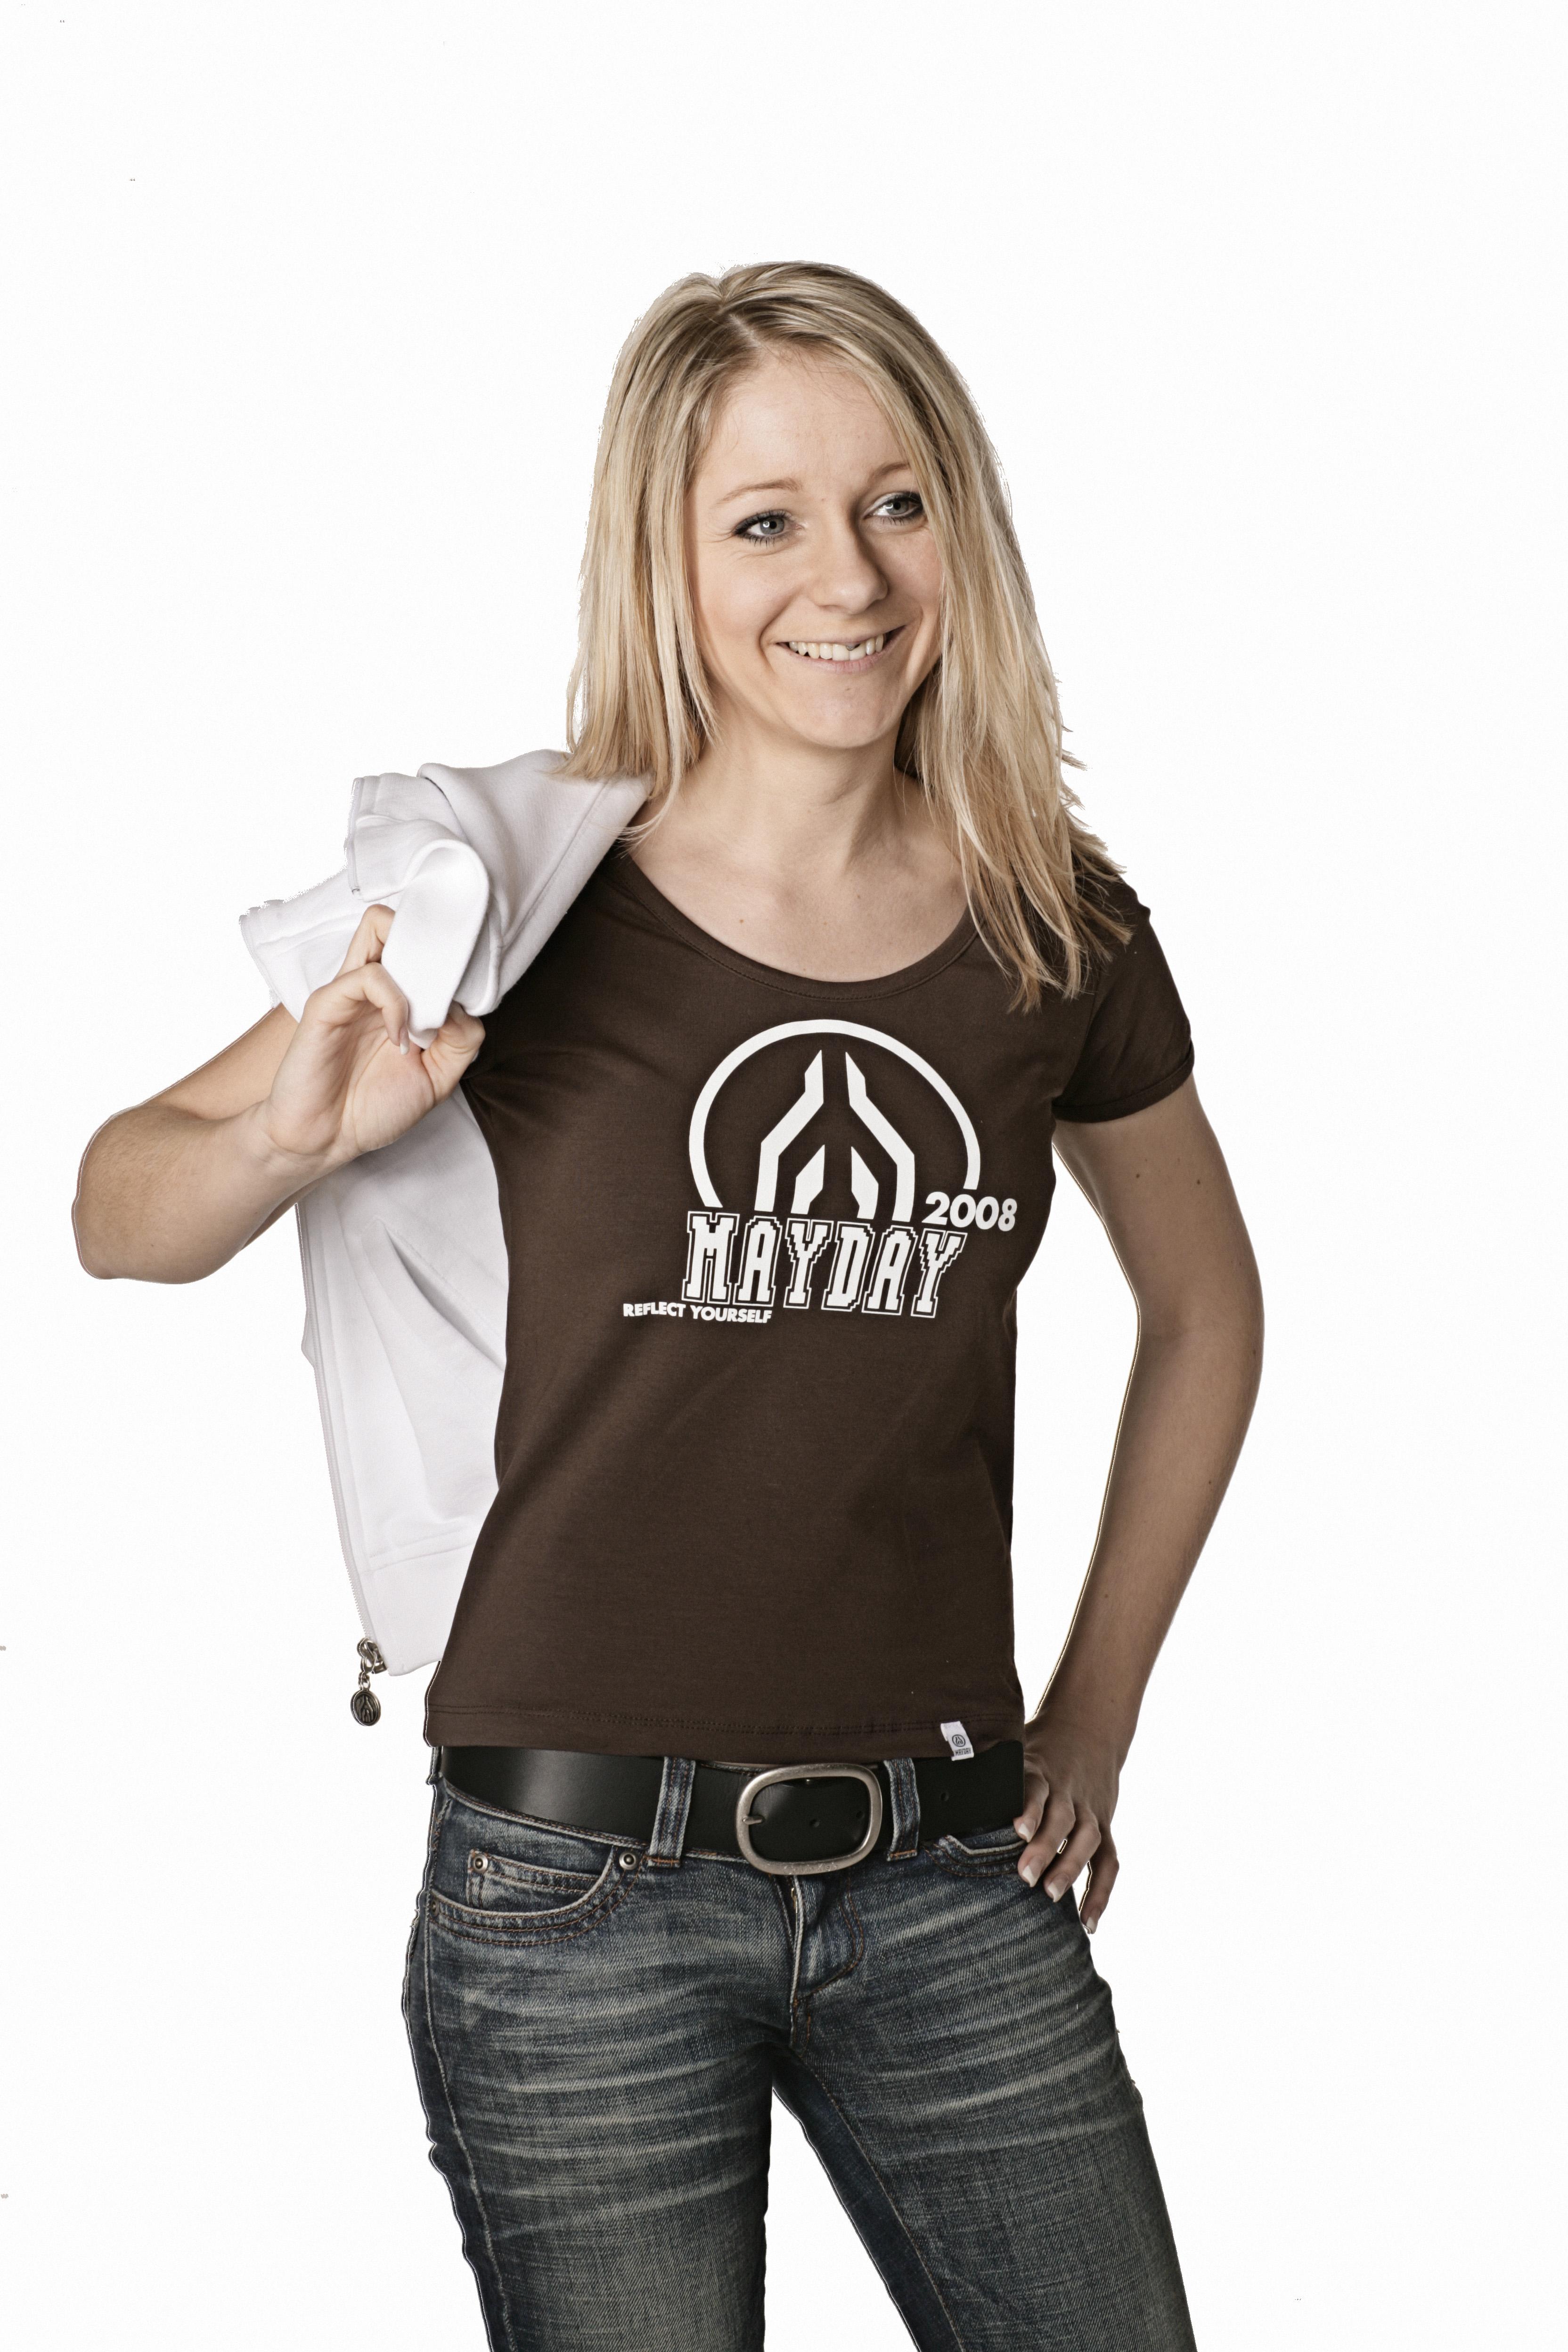 MAYDAY 2008 | T-Shirt | Basic